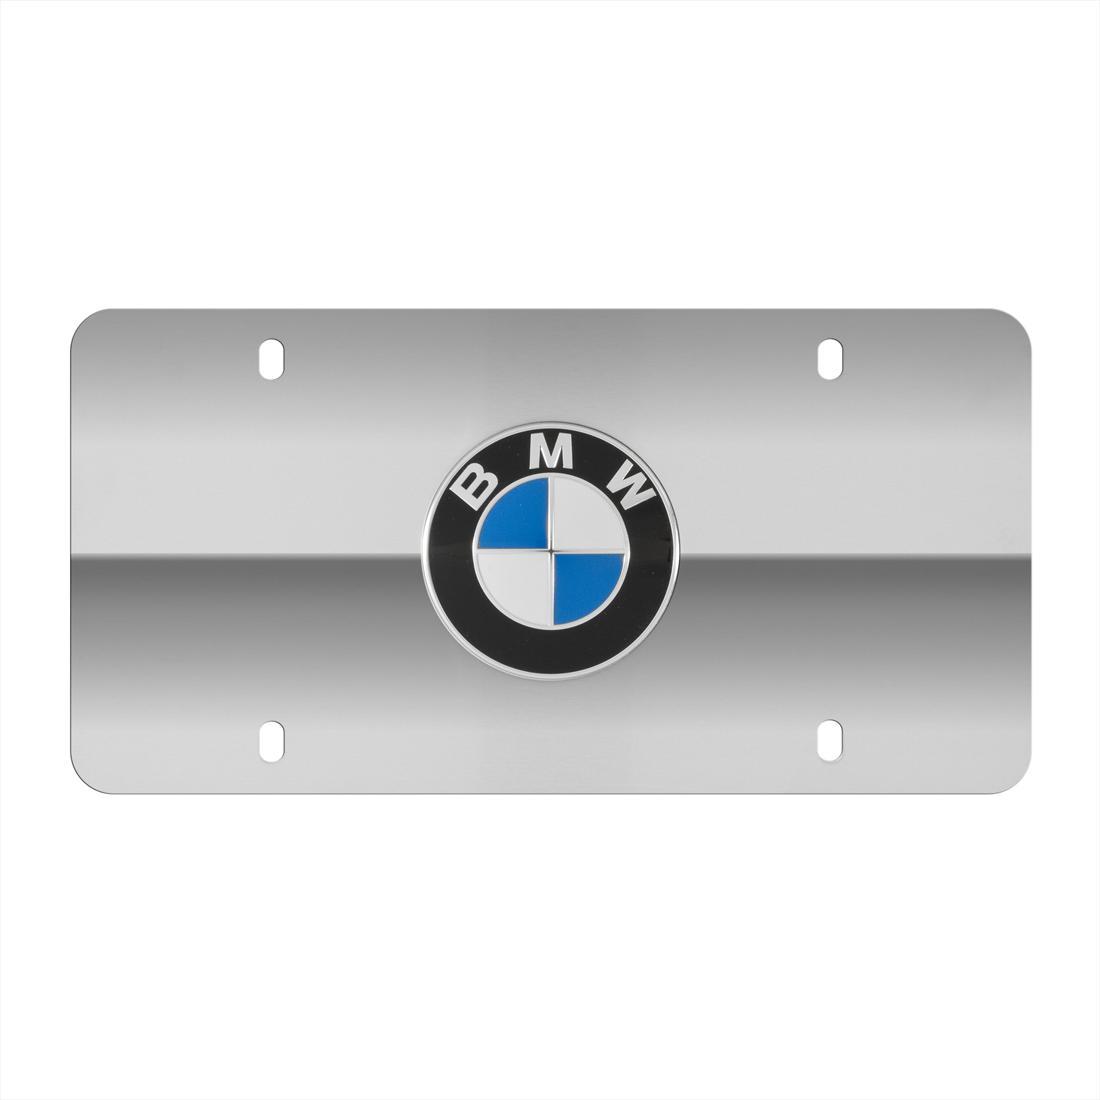 BMW Marque Plates